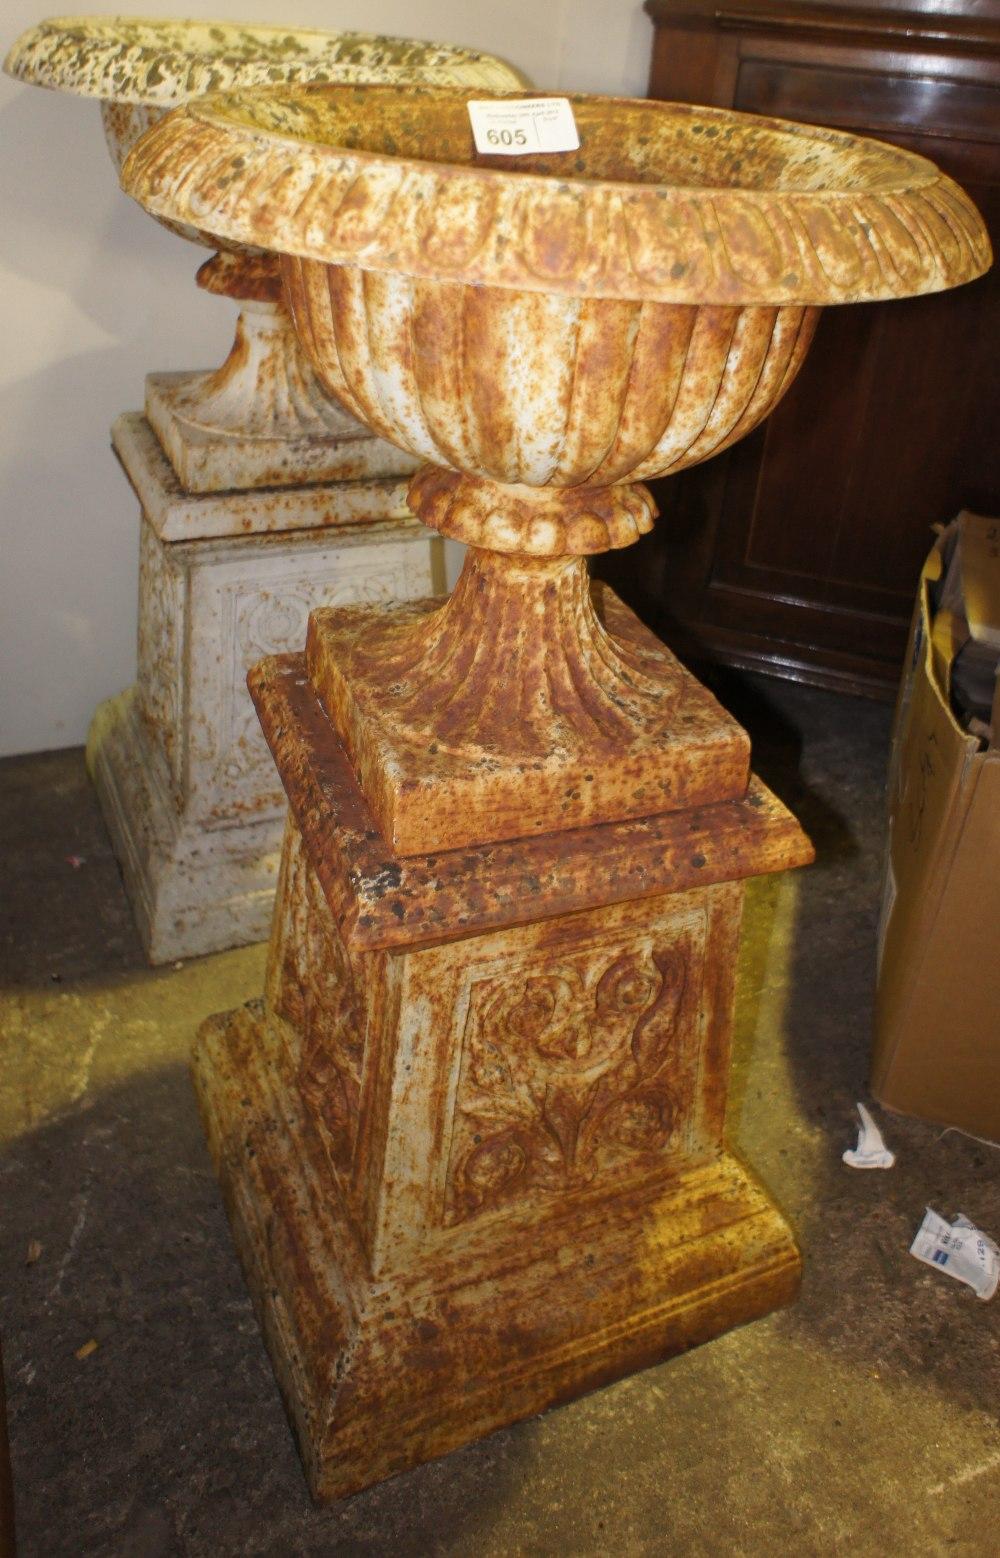 Lot 605 - NV- A pair of decorative classical design cast iron garden urns